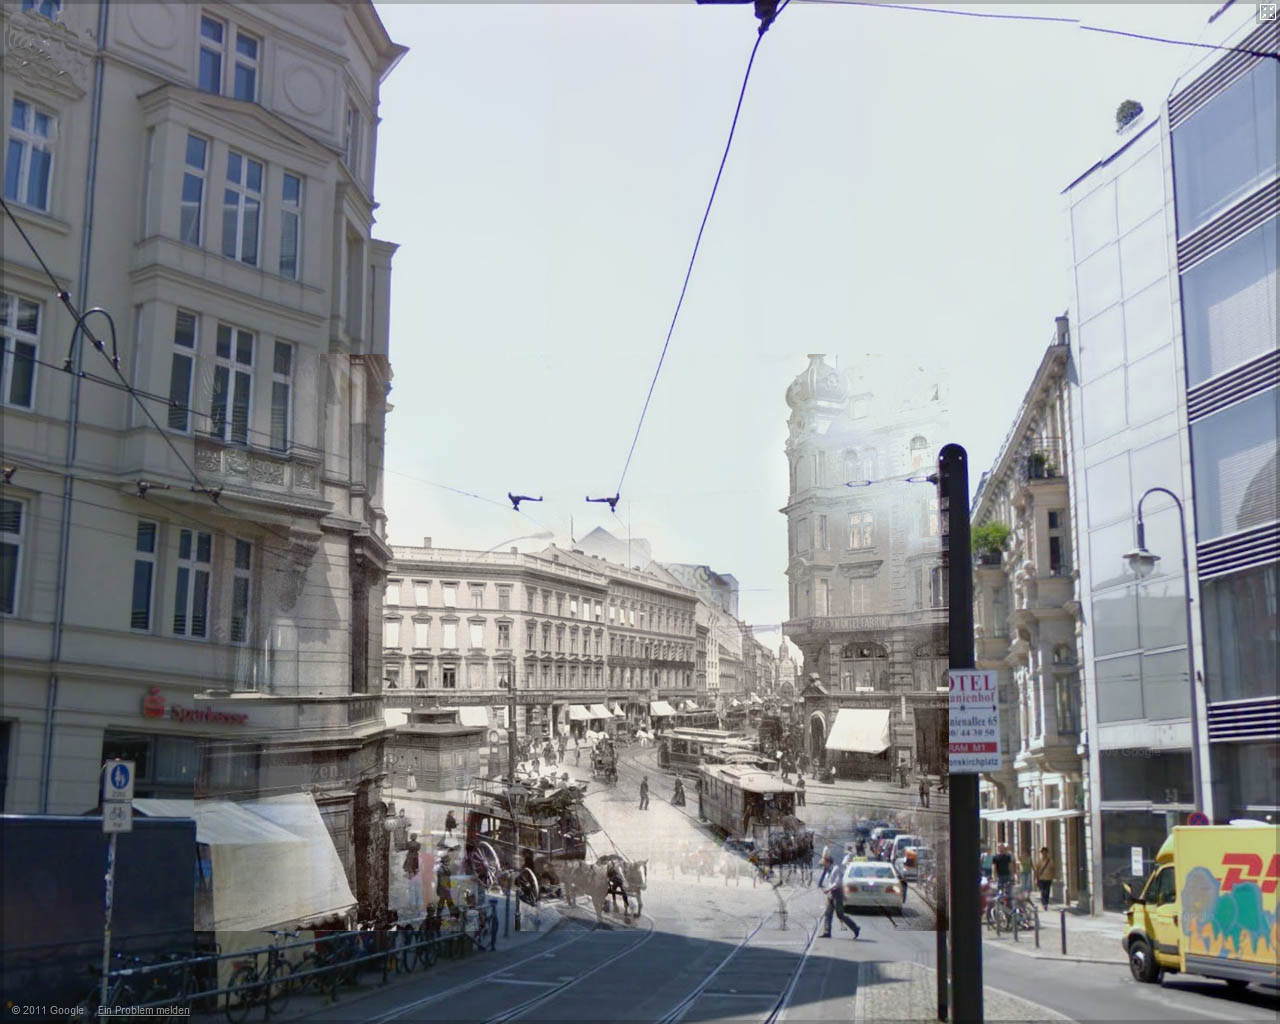 Refotografie - Hackescher Markt 1900/2008